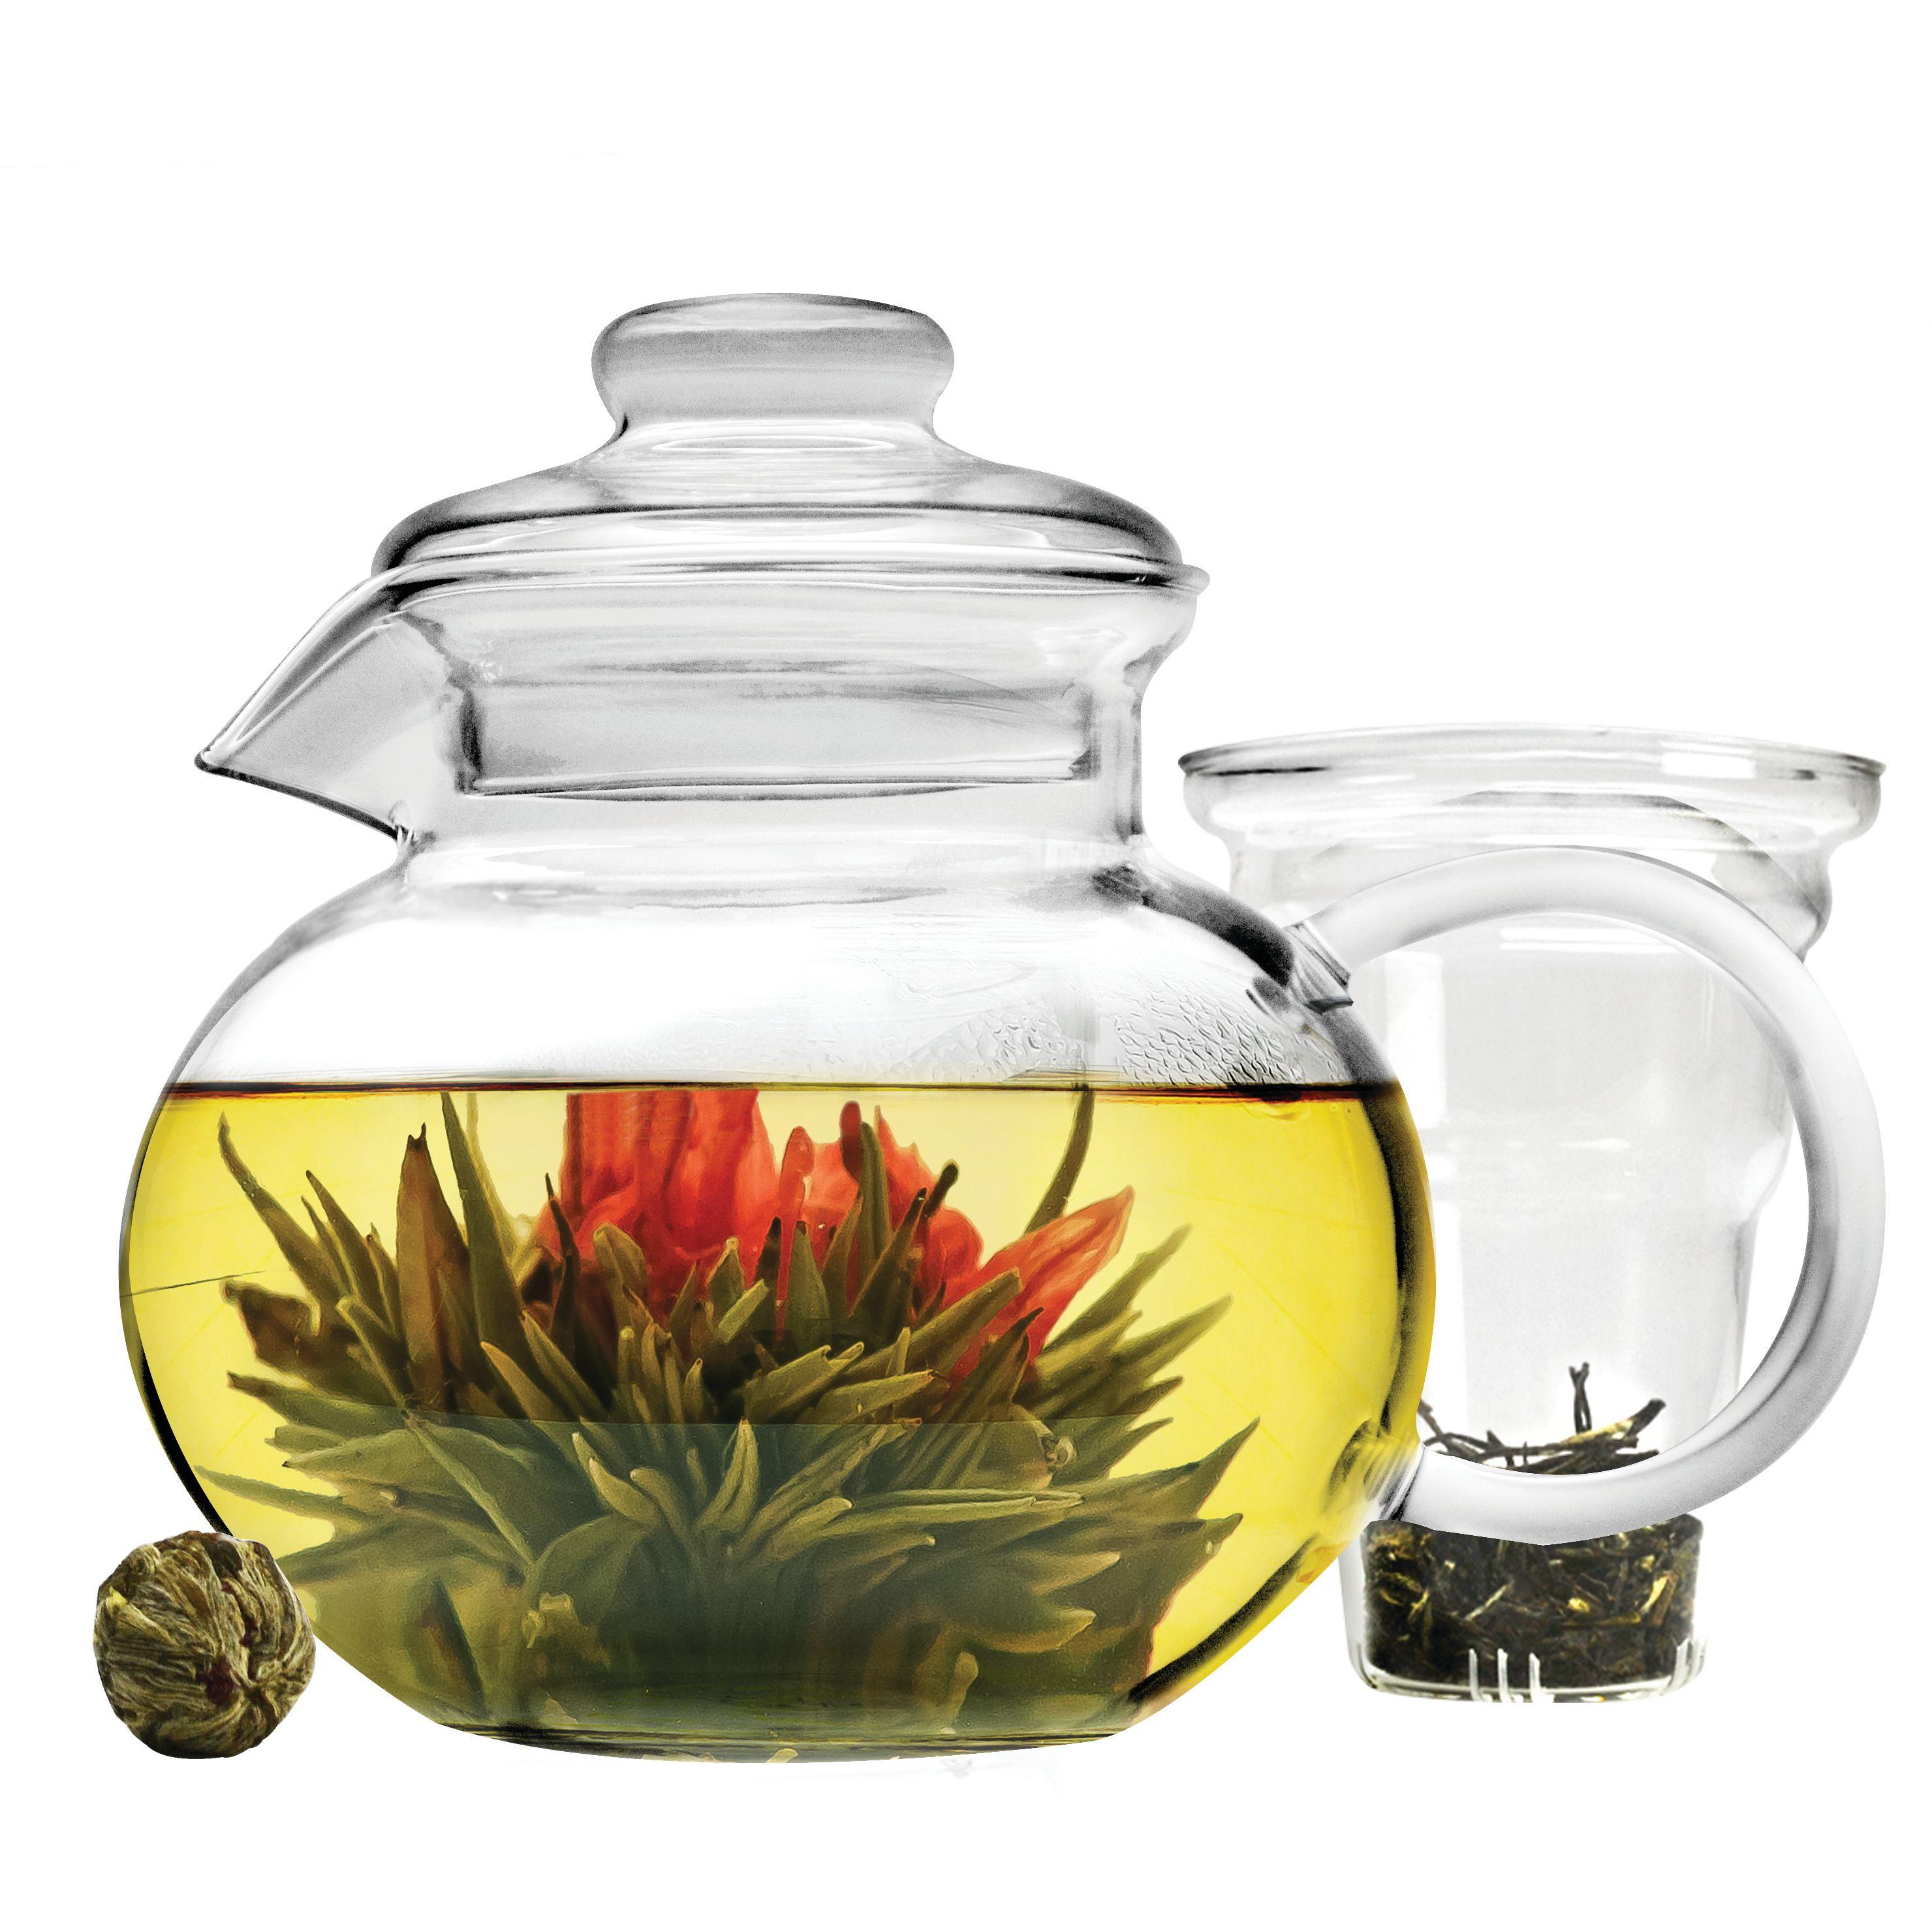 Primula Blossom 40 oz. Temperature Safe Glass Teapot with Glass Loose Leaf Tea Infuser and 1 Tea Flower